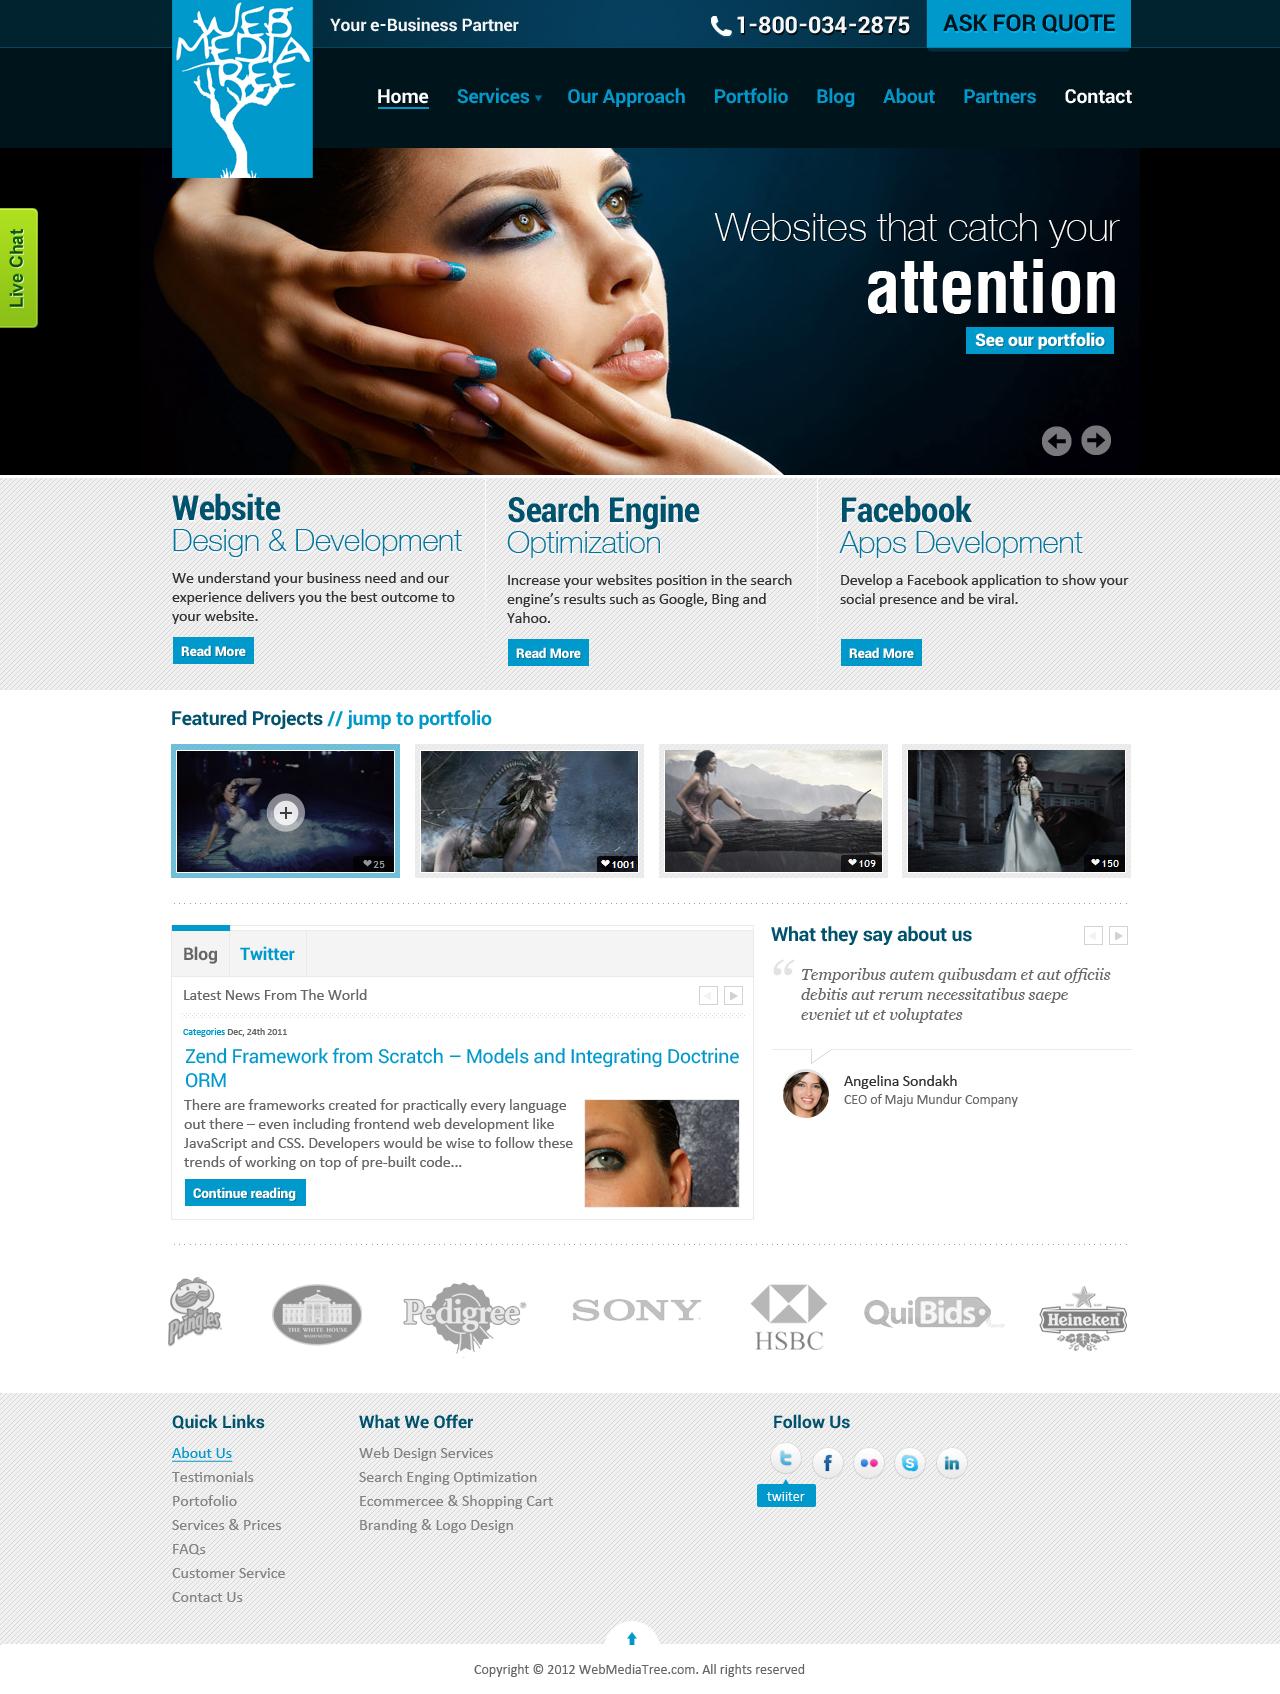 WebMediaTree.com version 2